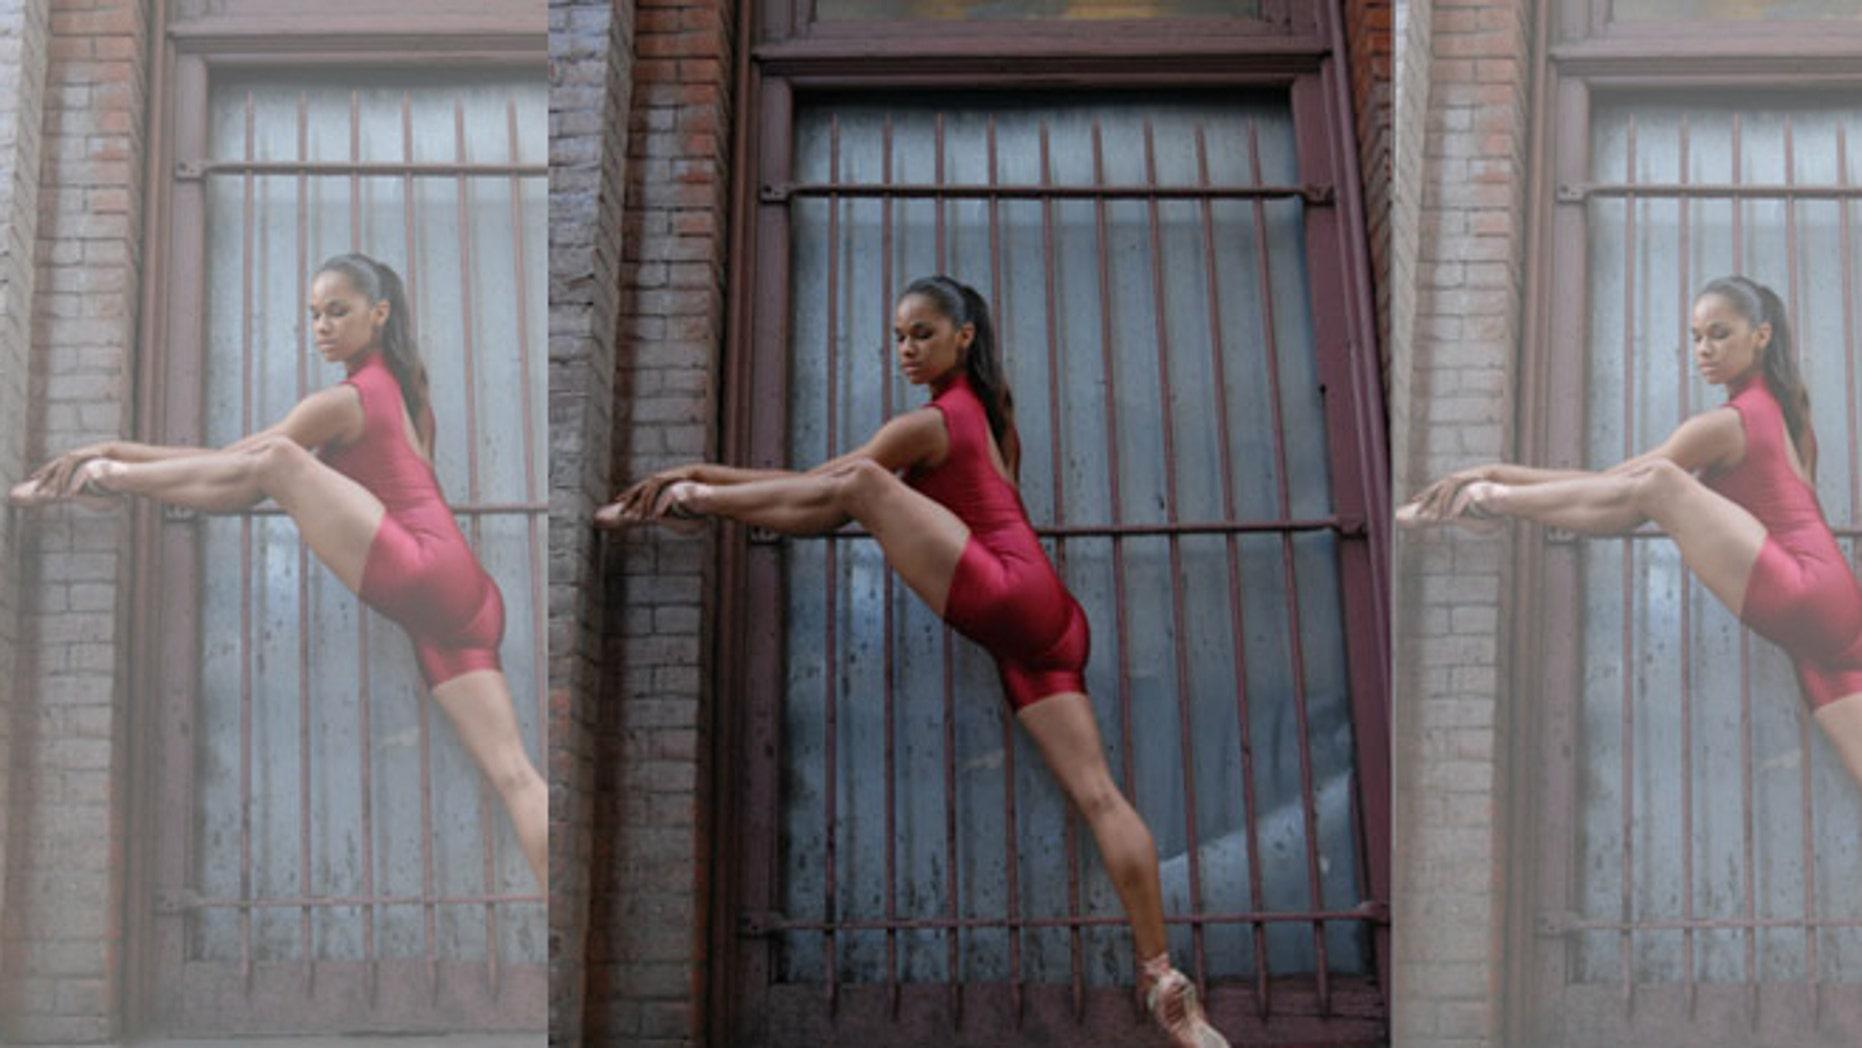 Sensational Stretching Beauty Ballerina Misty Copeland On Her Body Machost Co Dining Chair Design Ideas Machostcouk